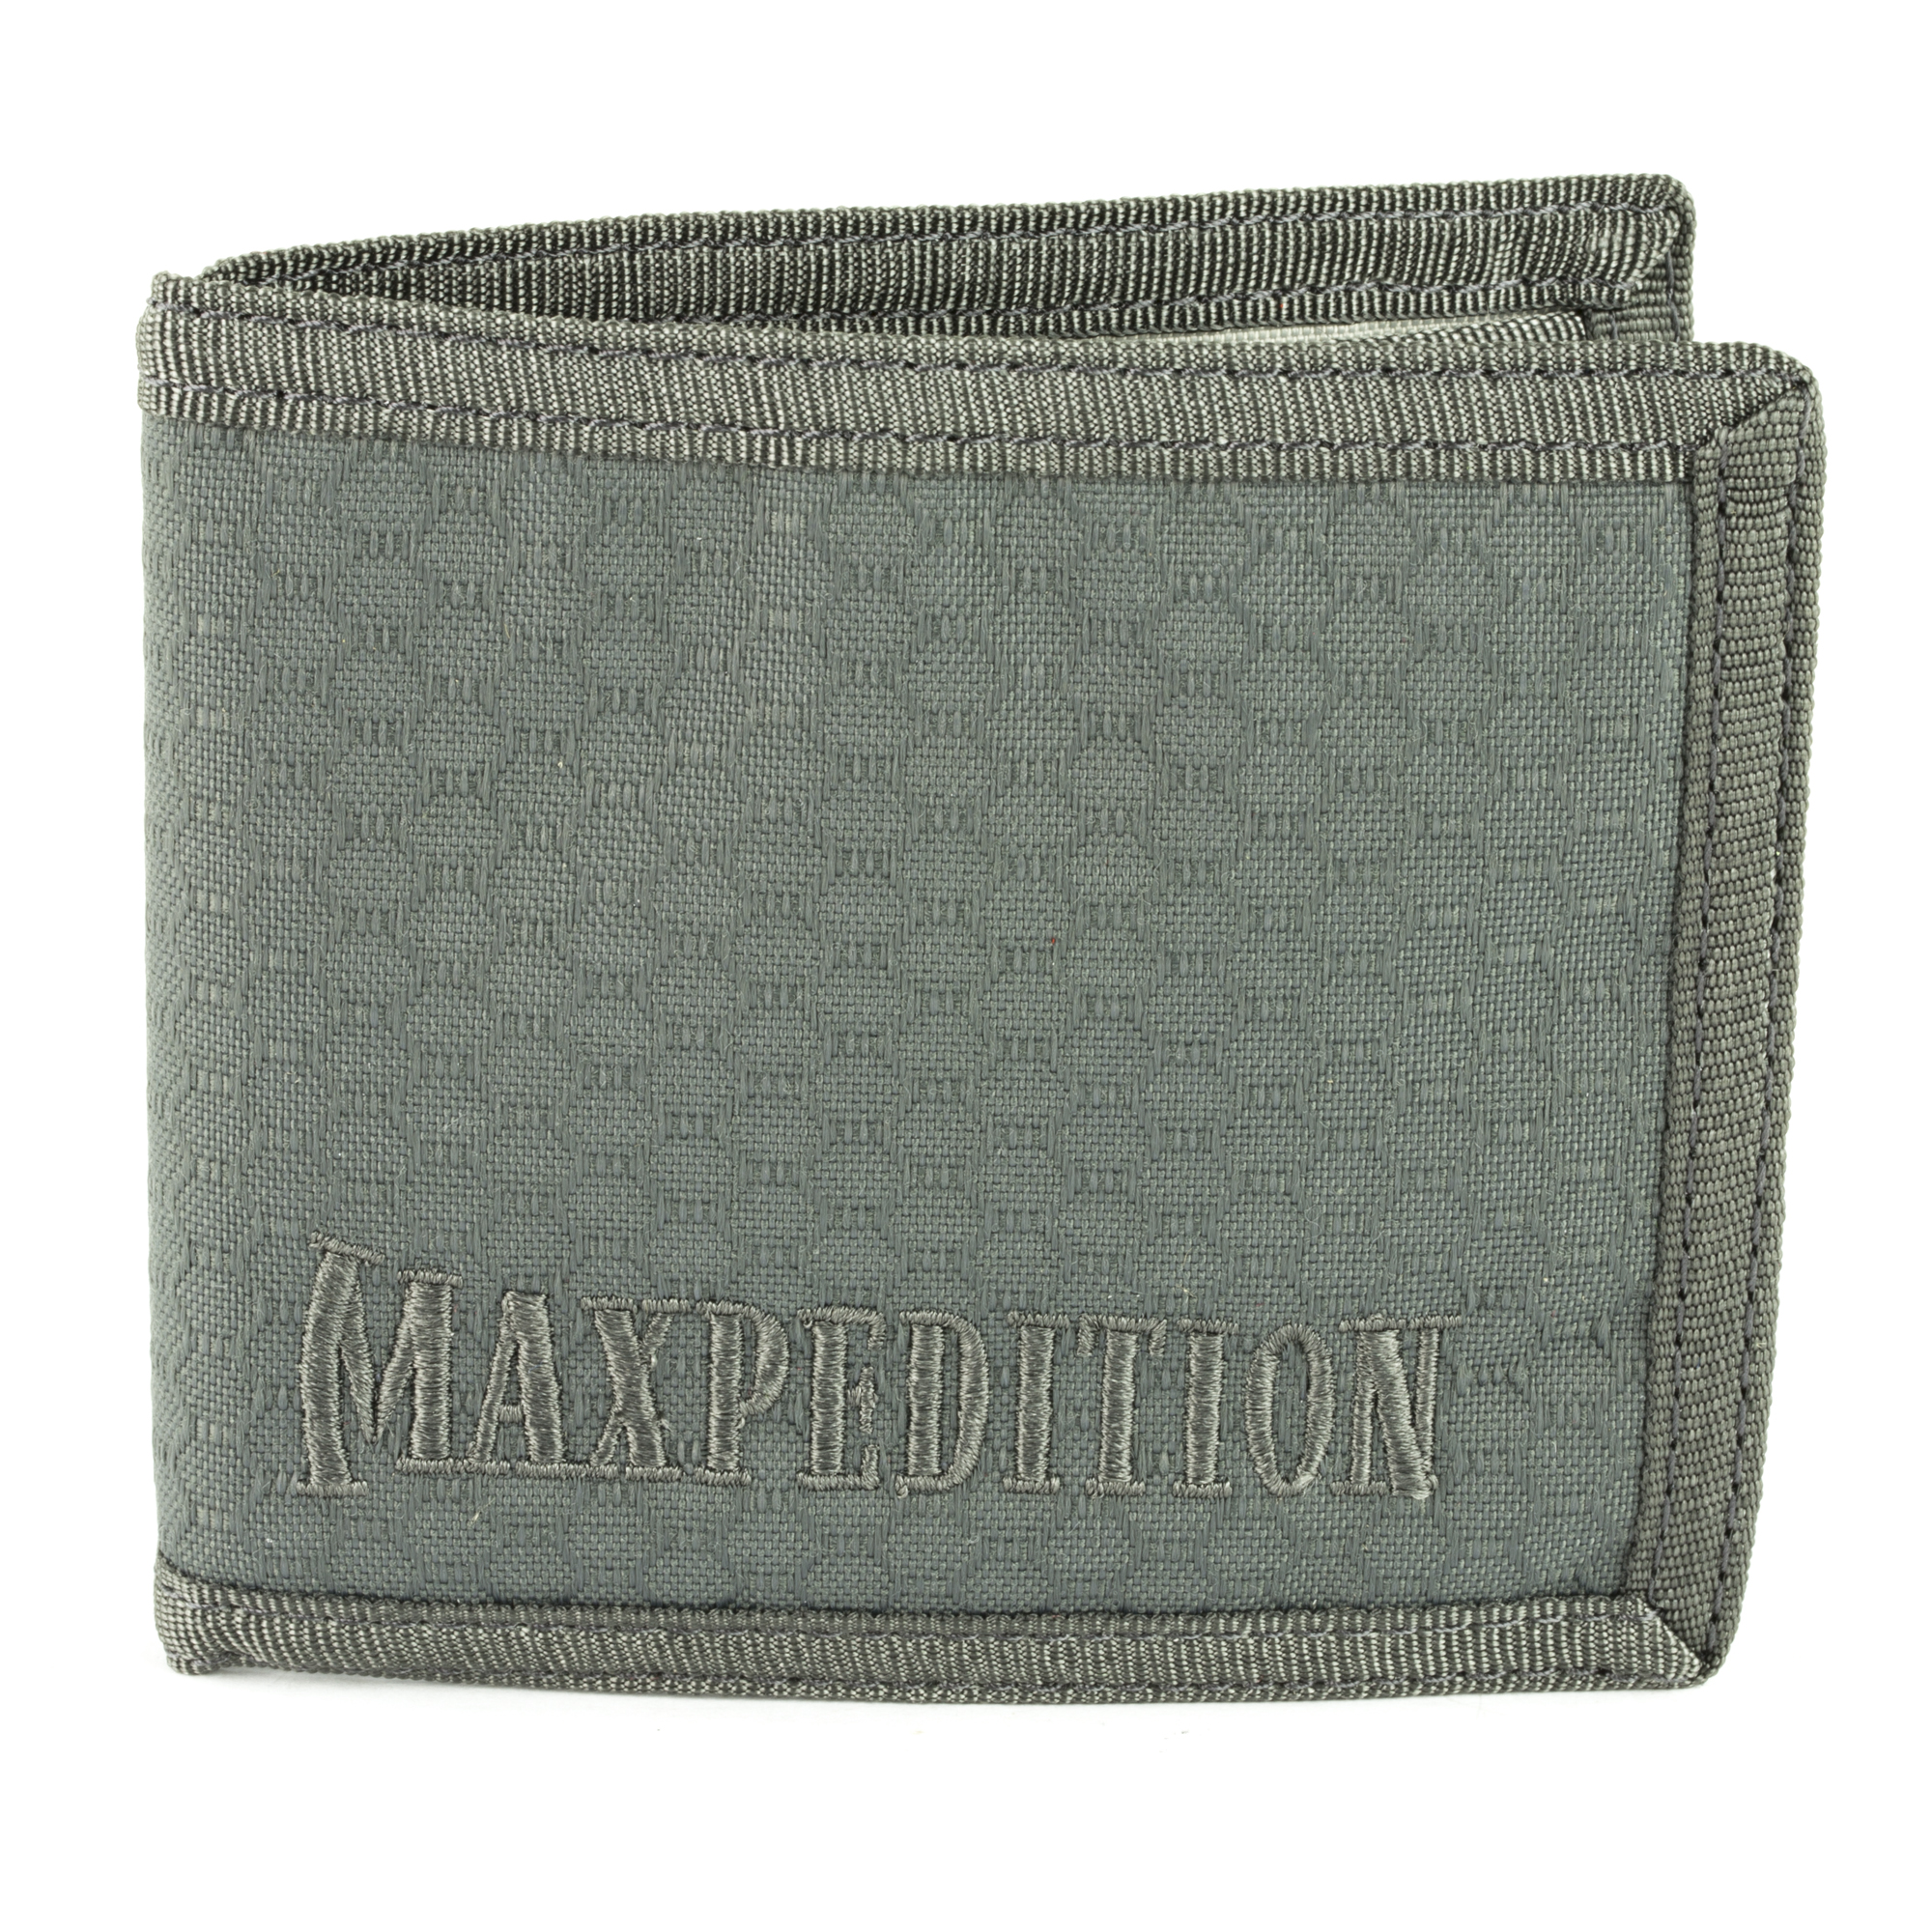 Maxpedition Bfw Bi Fold Wallet Gry